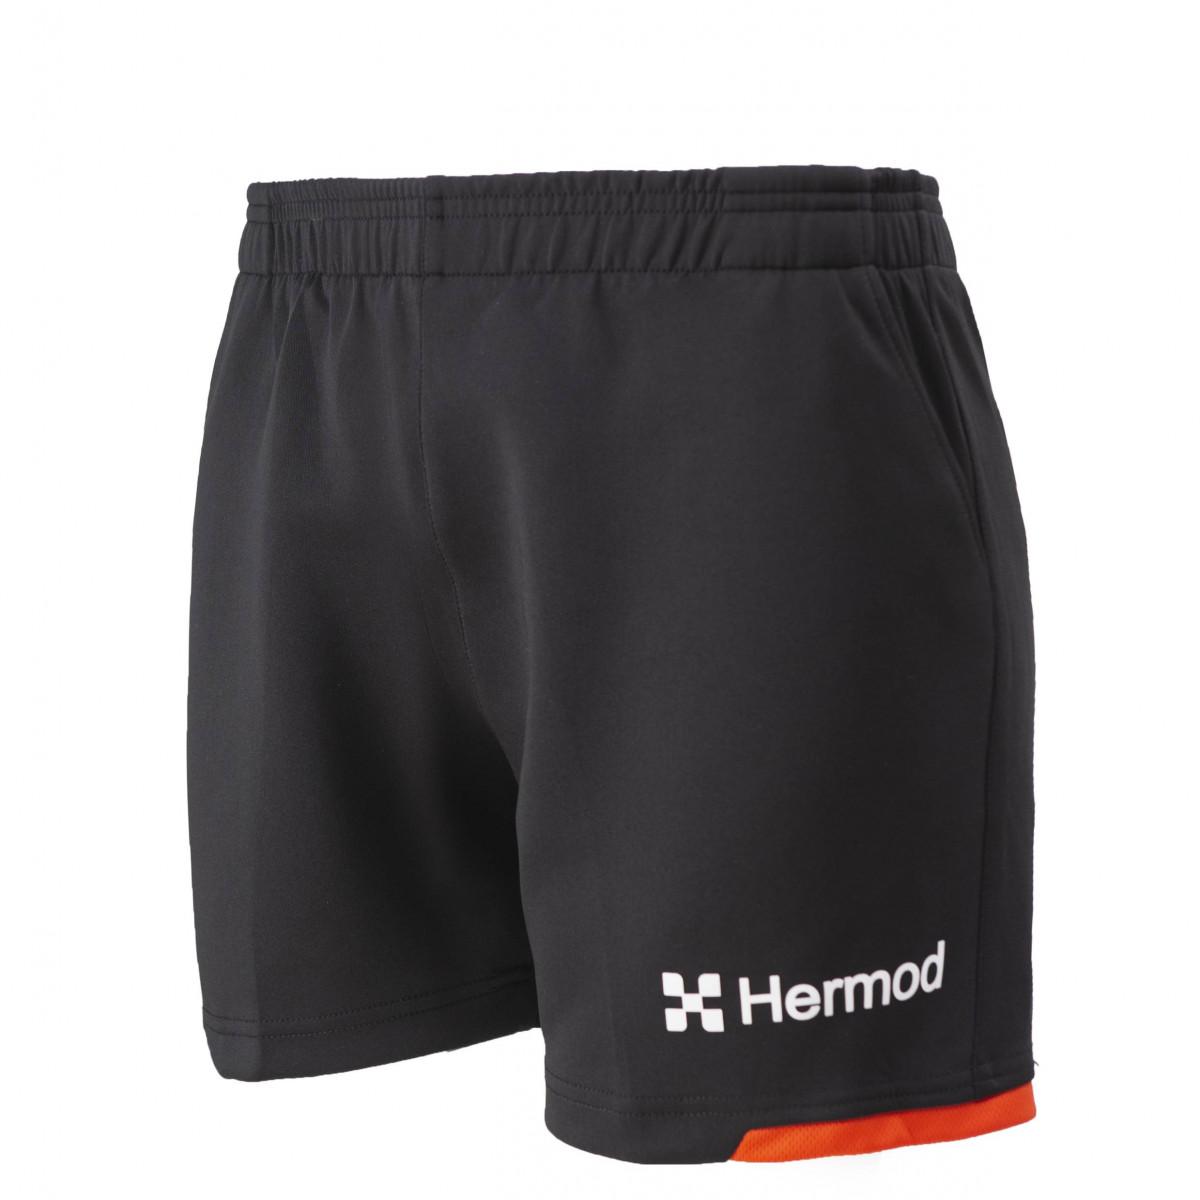 Quần nữ hermod - basic 01 BQW01